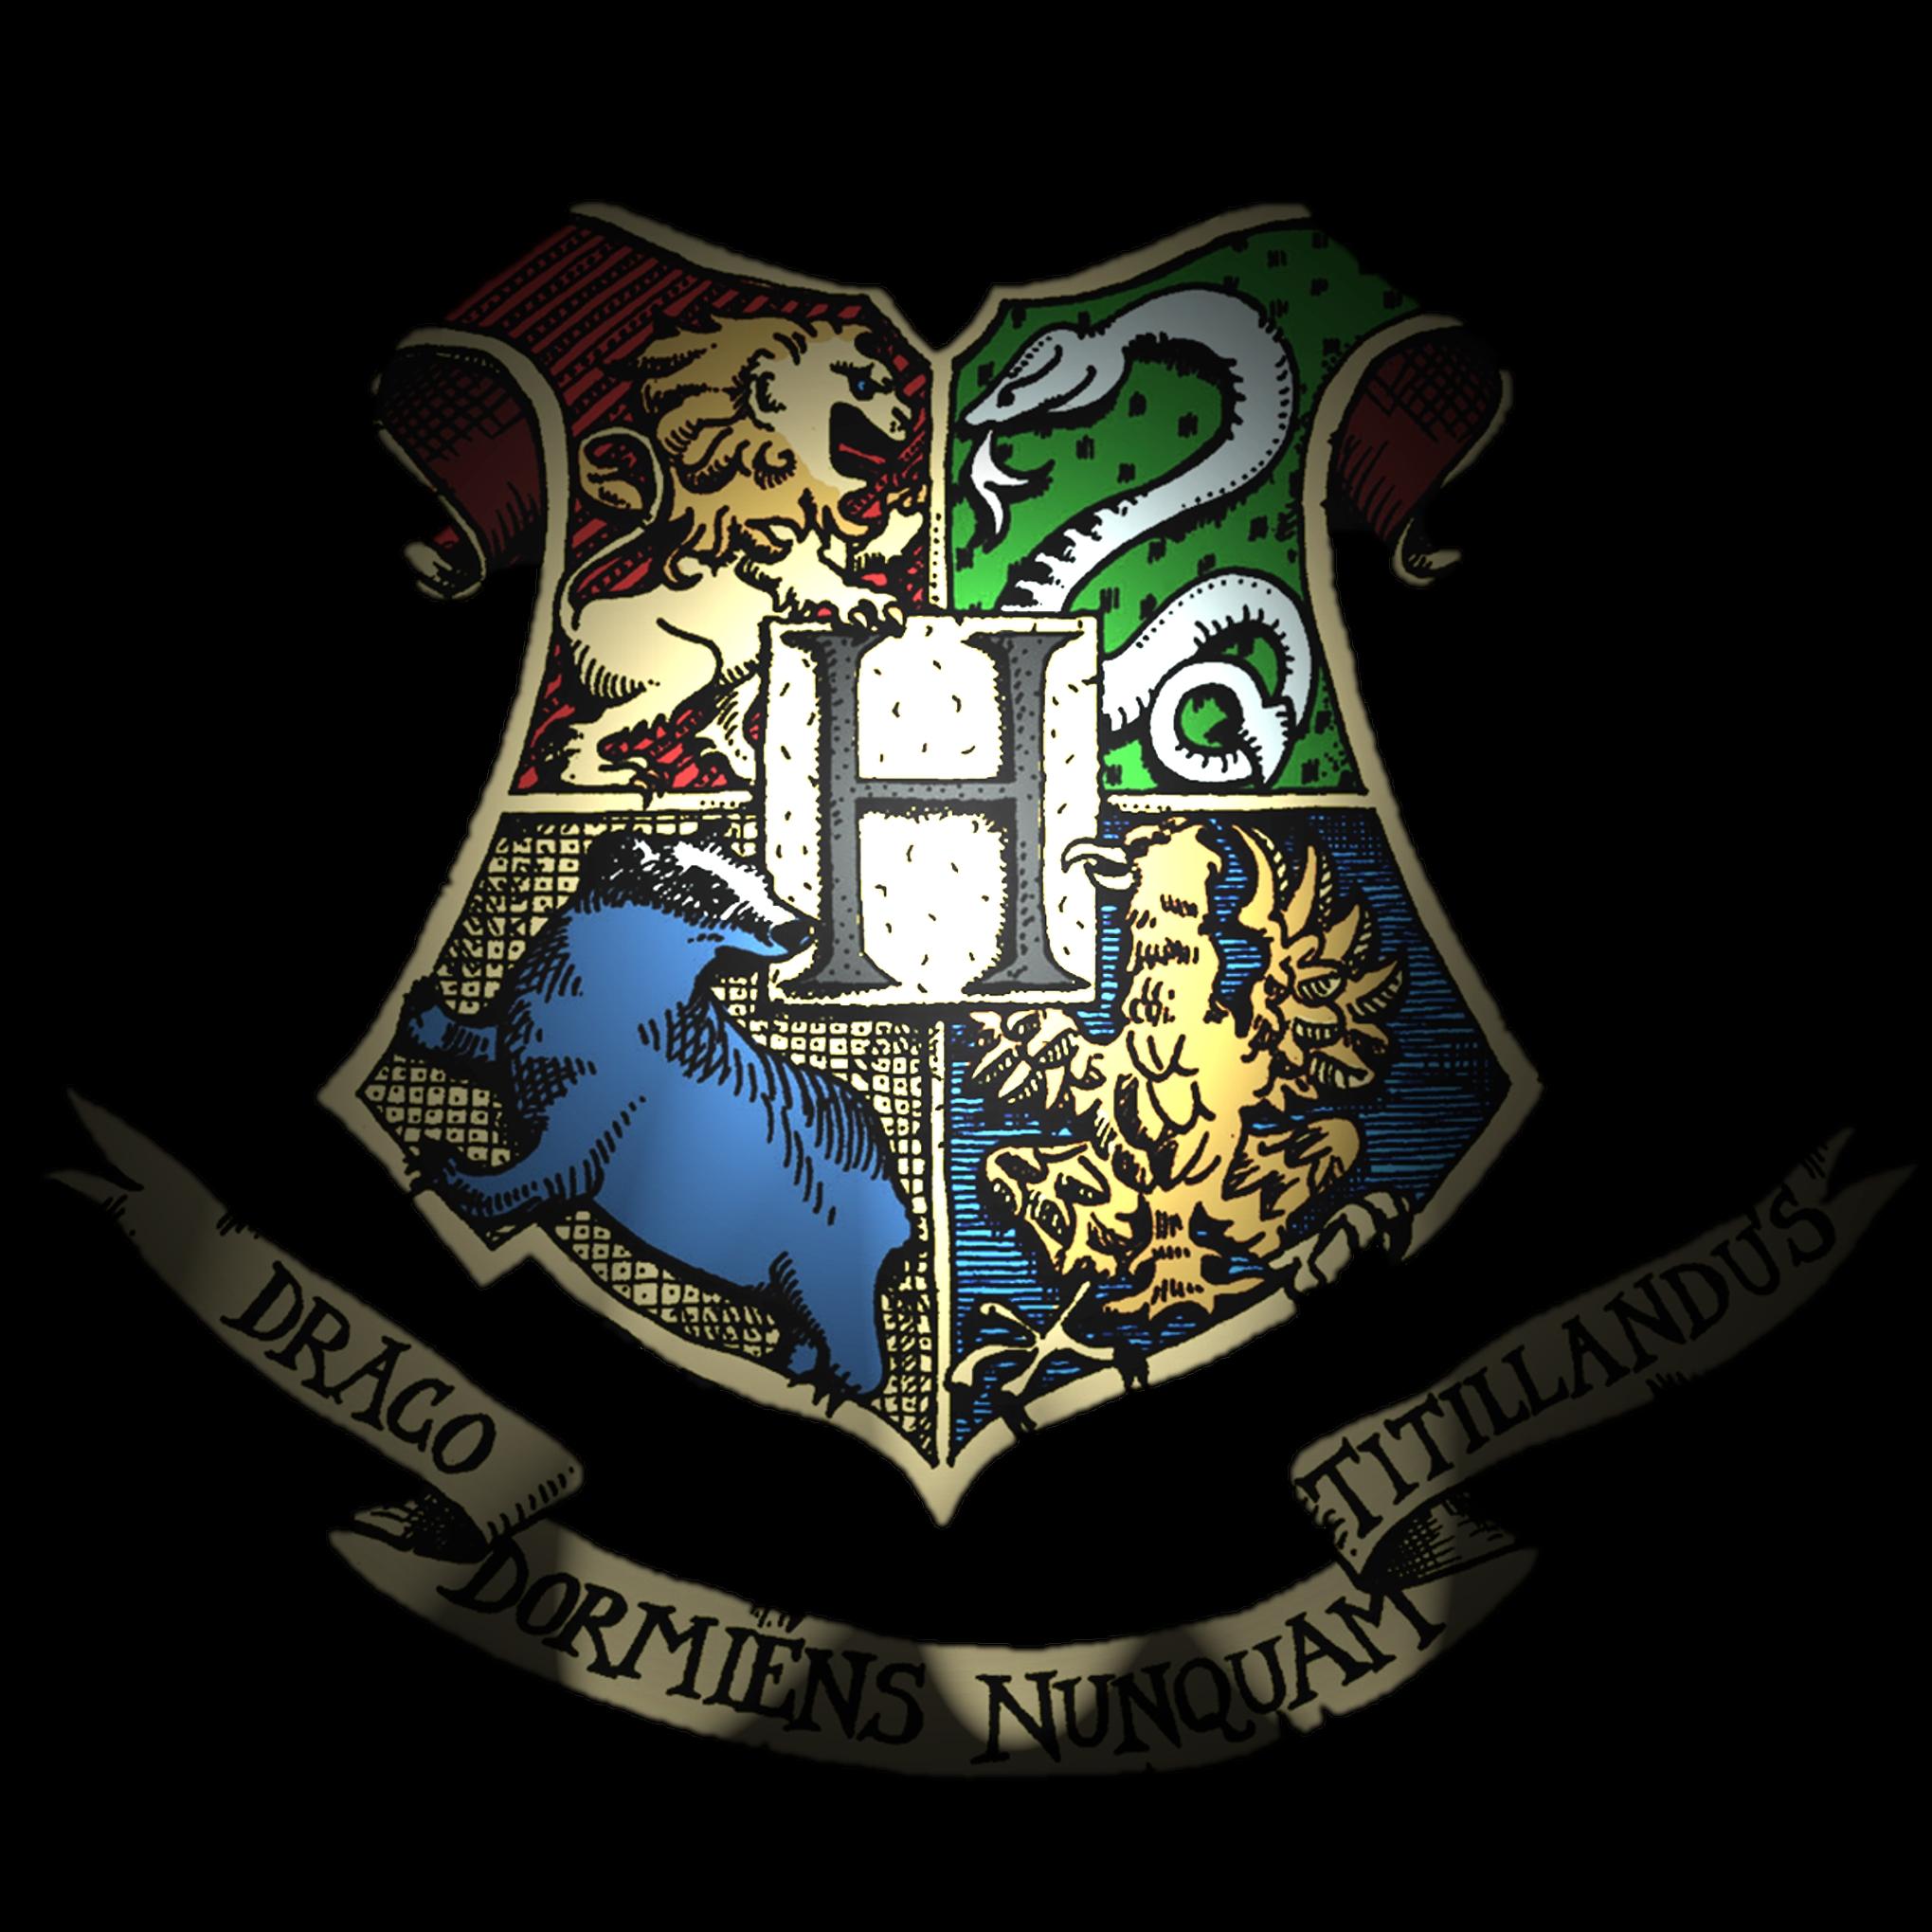 Harry Potter Hogwarts Crest Wallpaper Harry potter fans can now 2039x2039